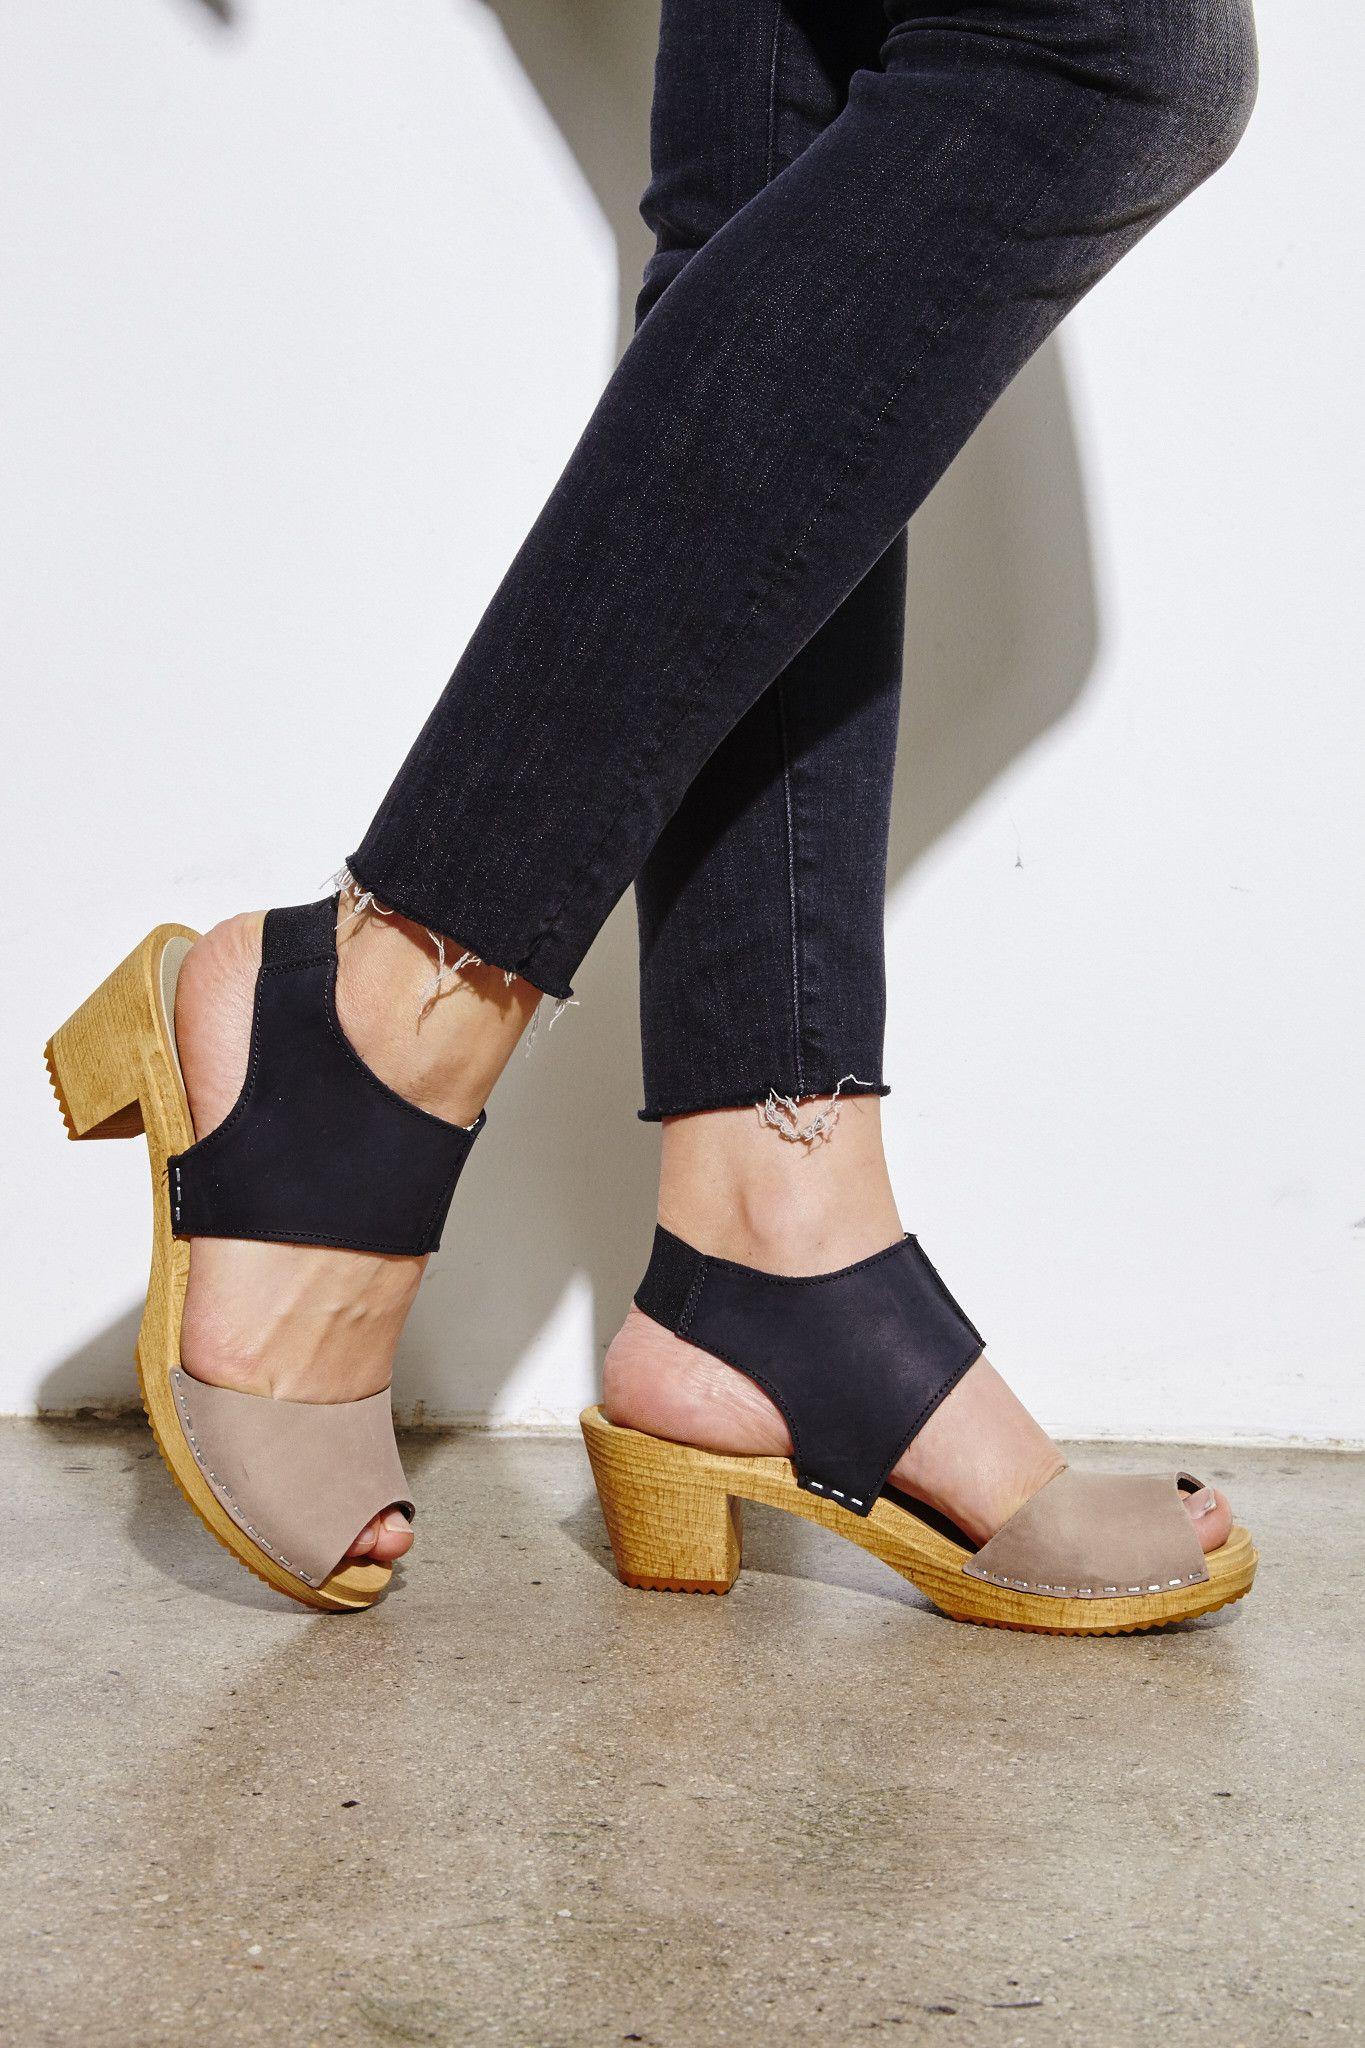 Black nina sandals - Nina Z The Nina Sandal From Bucks